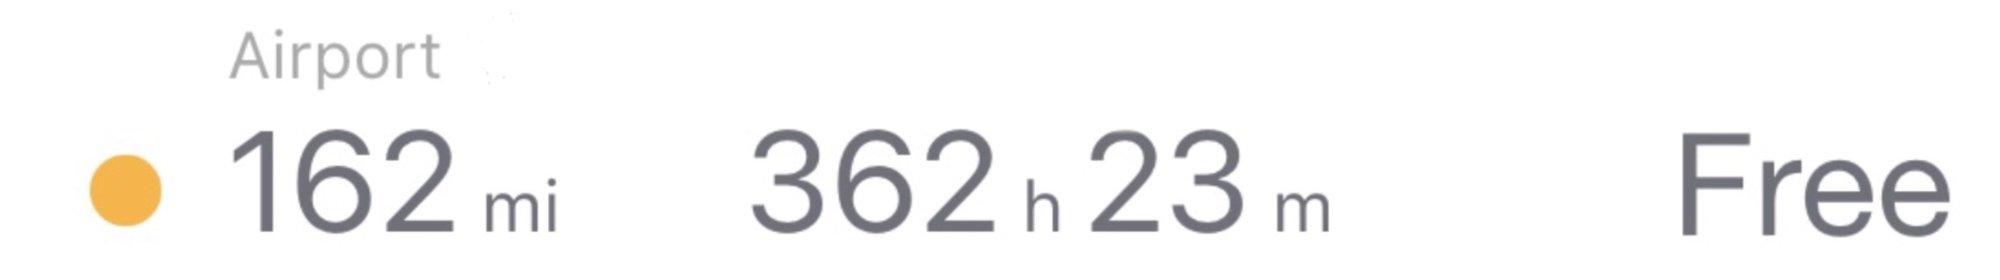 0082F2EB-F39C-48B5-B8CD-90C624EC8F86.jpeg